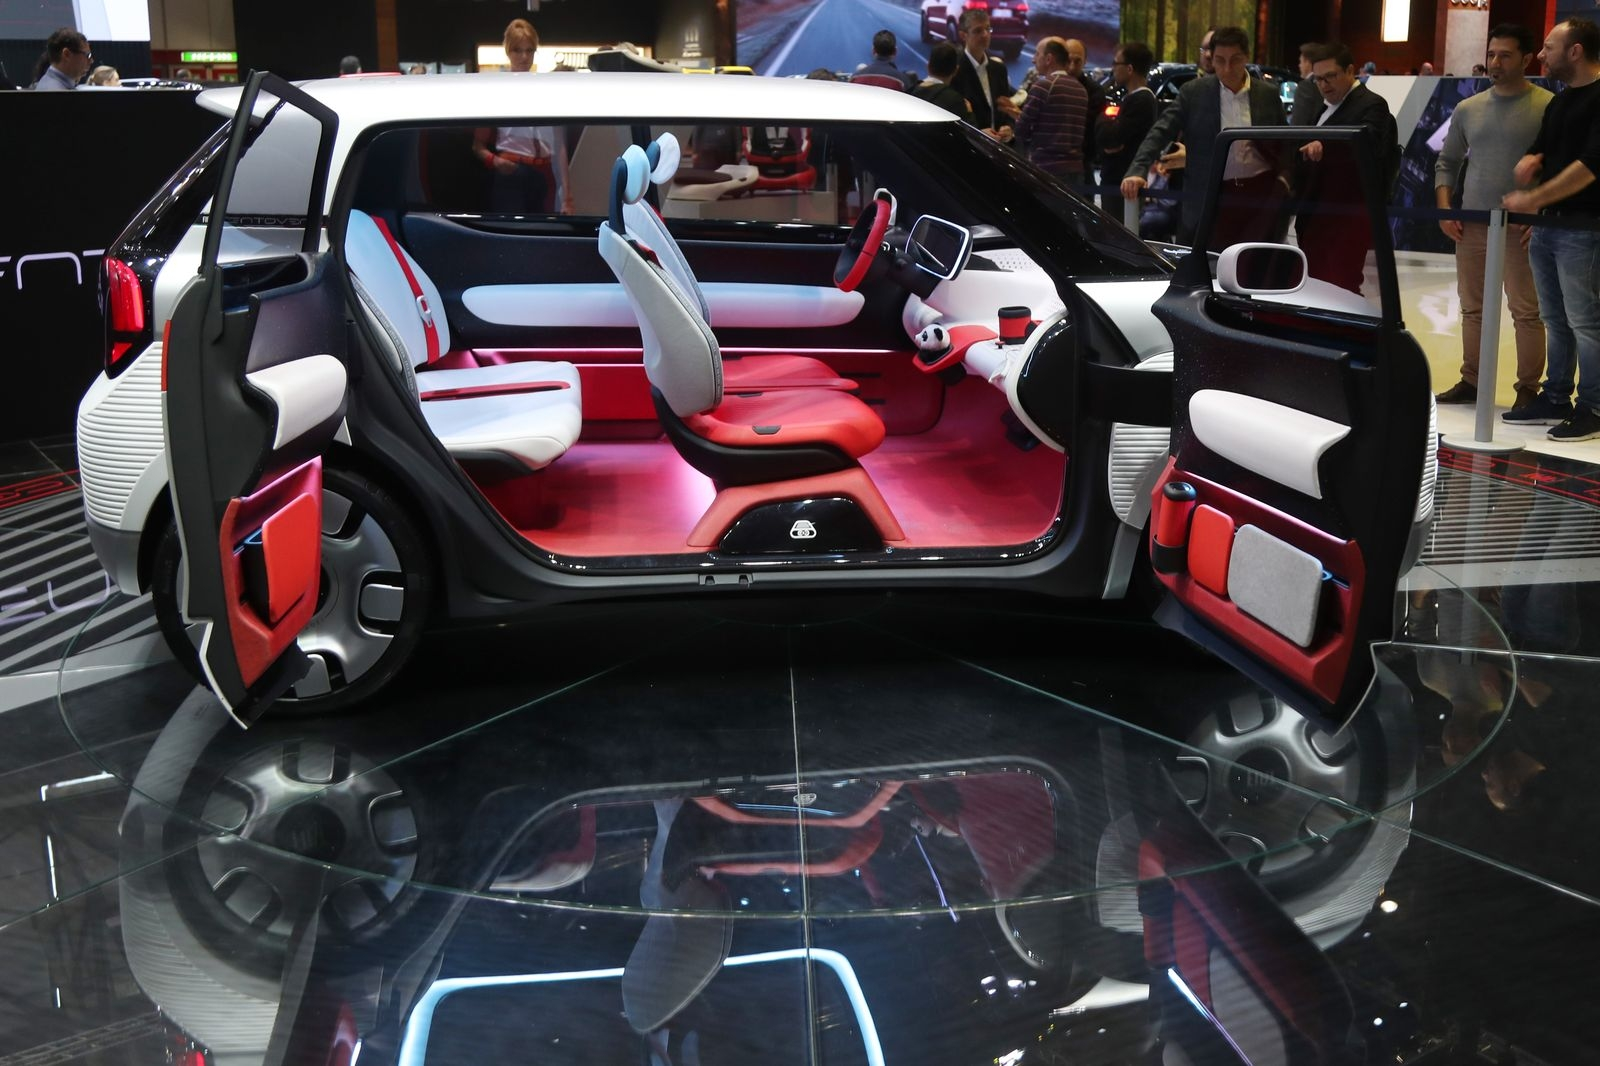 Fiat_Centoventi_AutoRok_2019_03